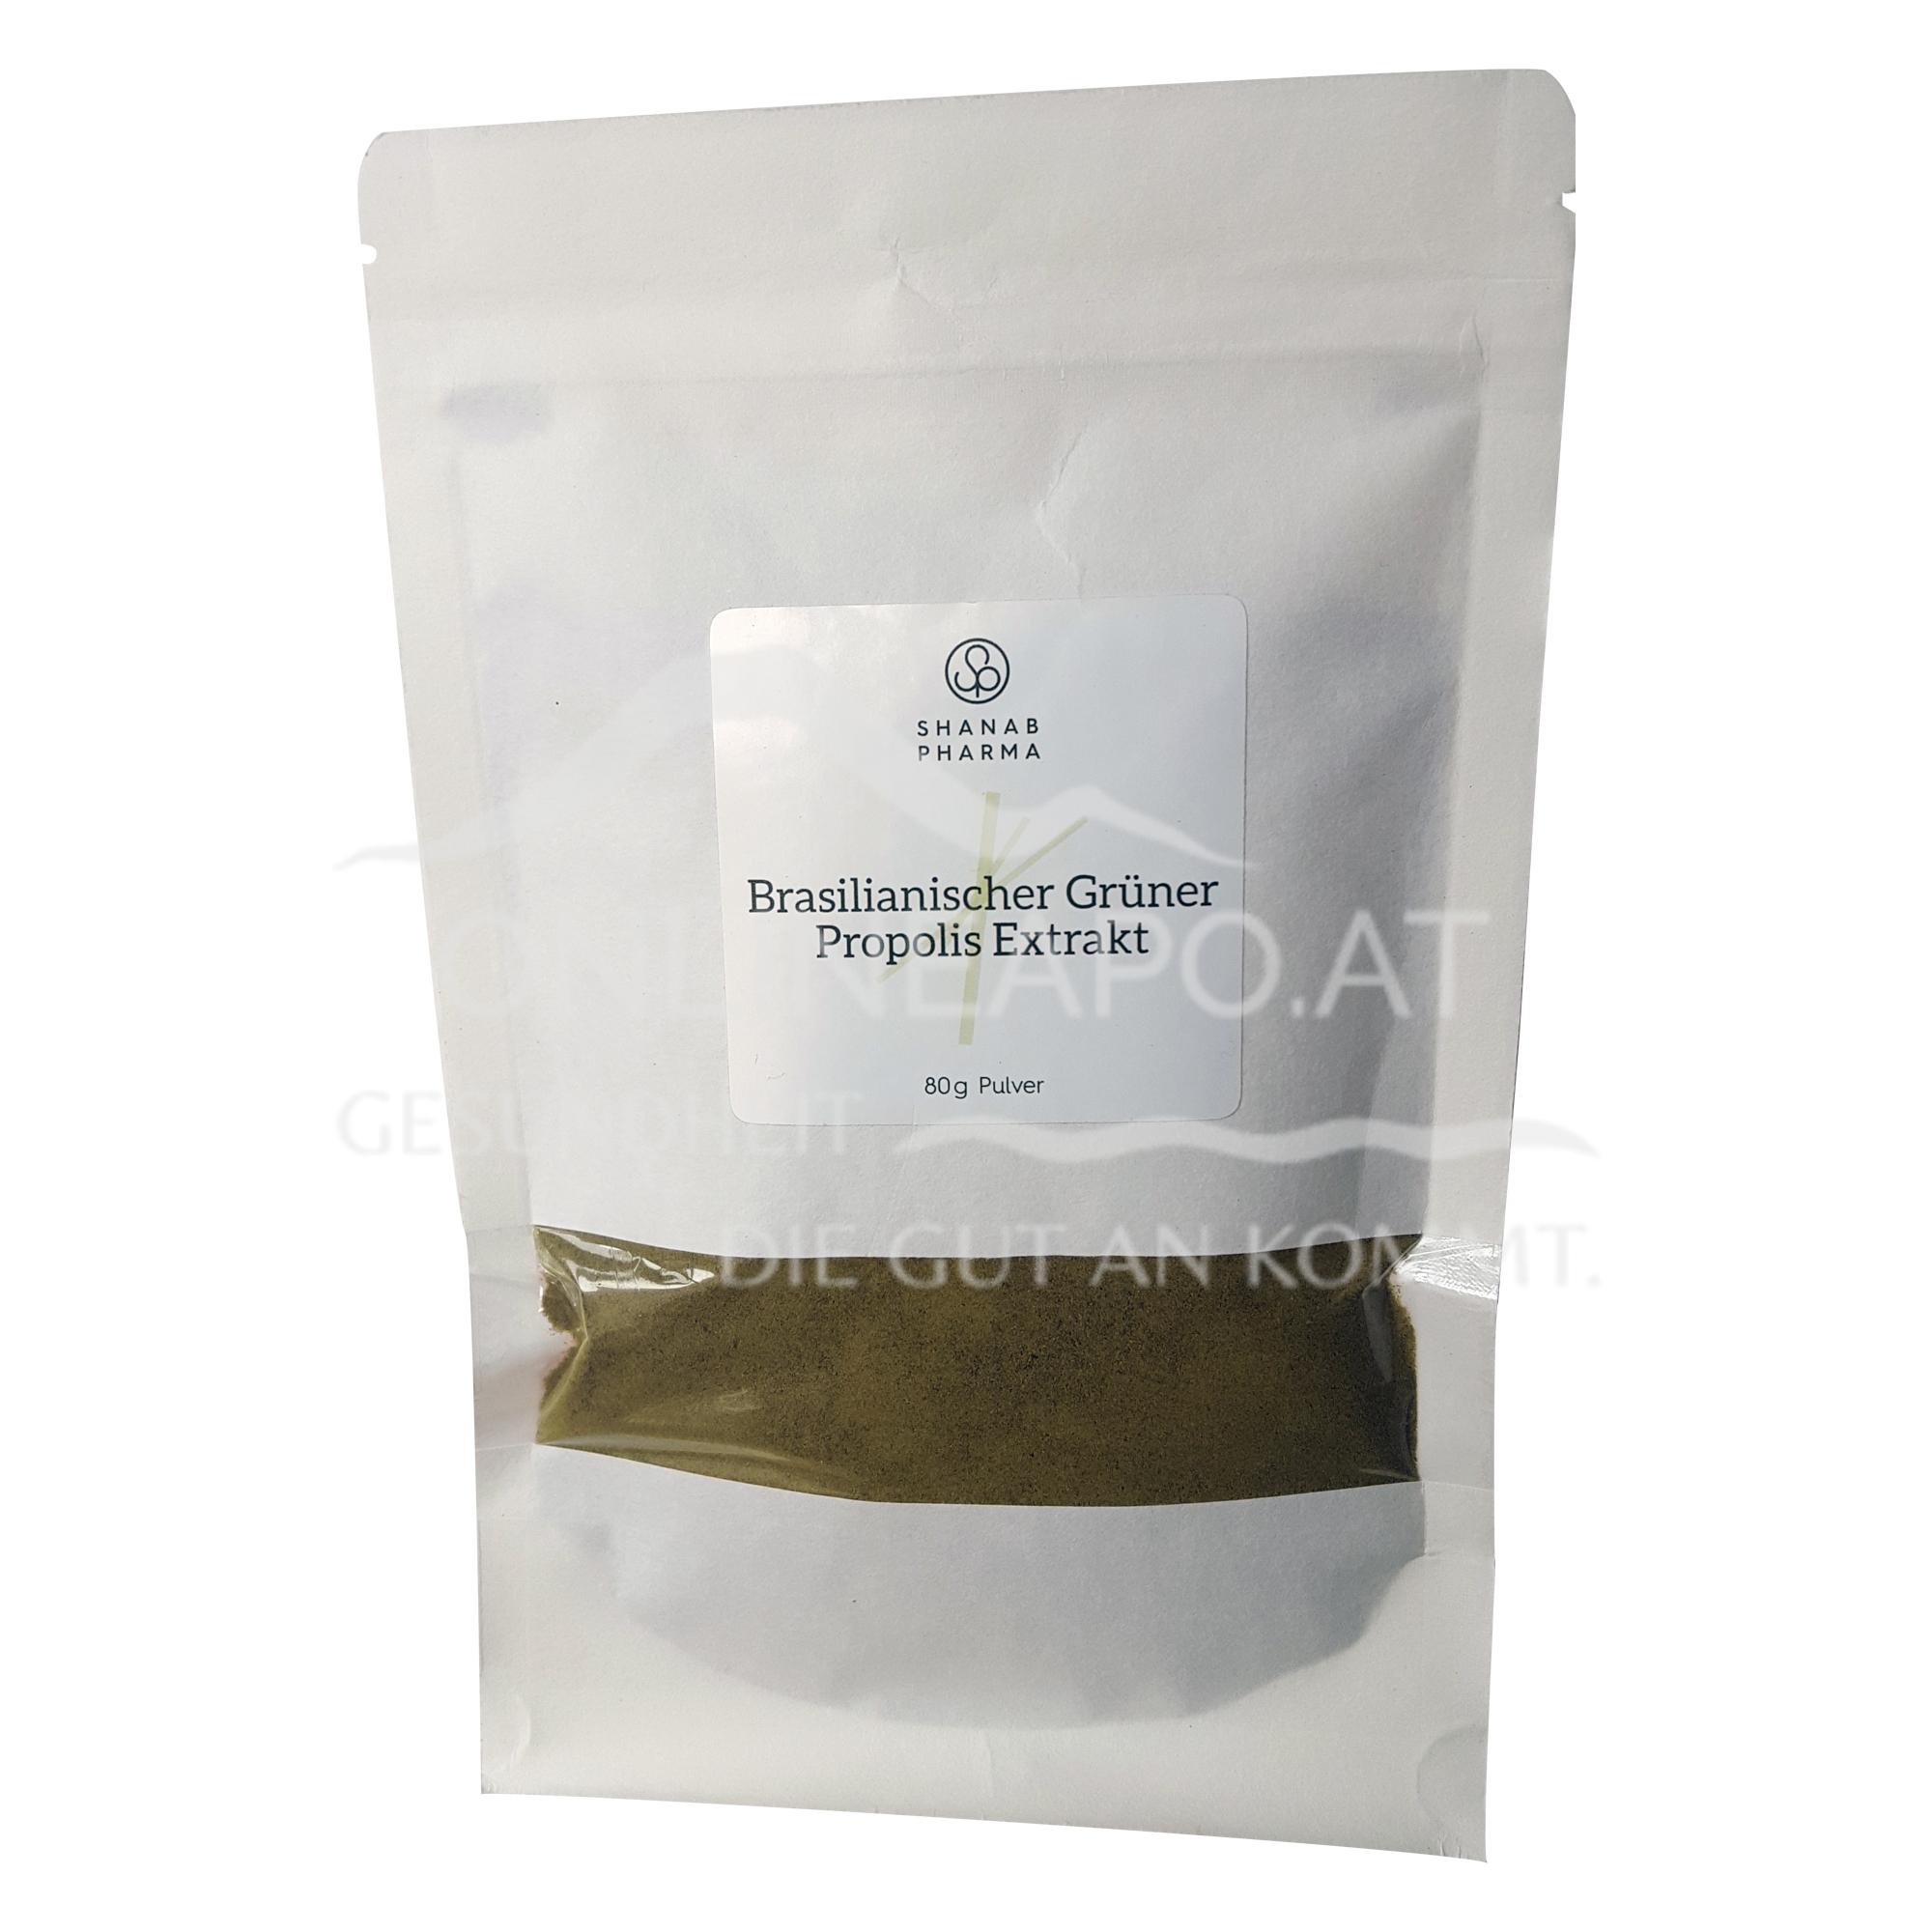 Shanab Pharma Brasilianischer Grüner Propolis Extrakt